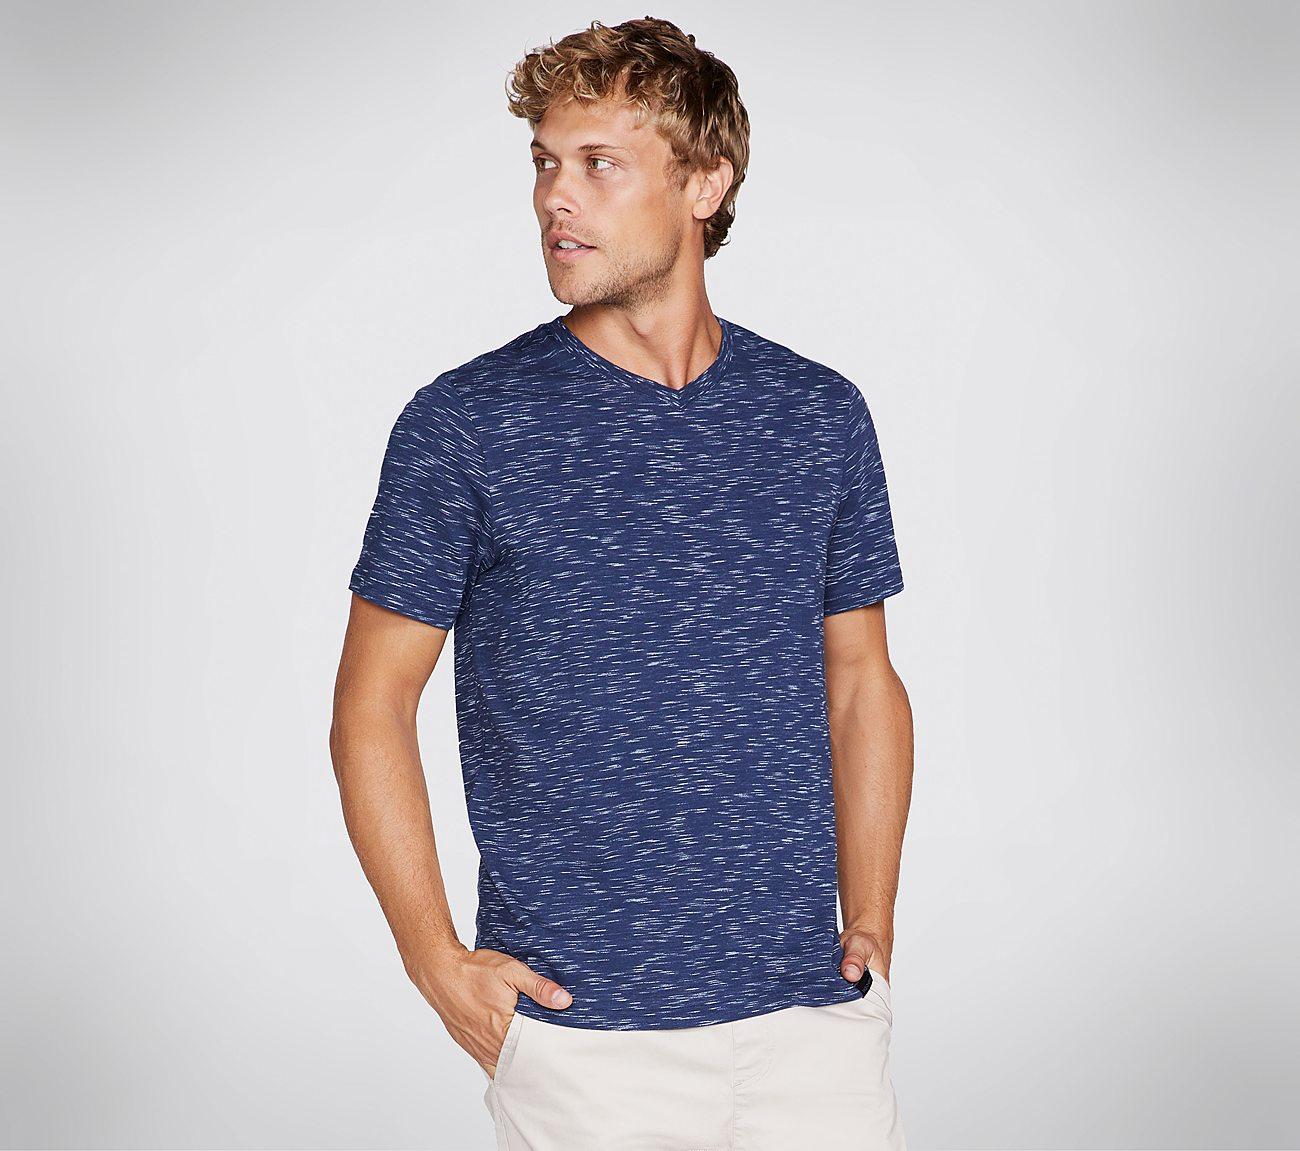 Fields V Neck Tee Shirt